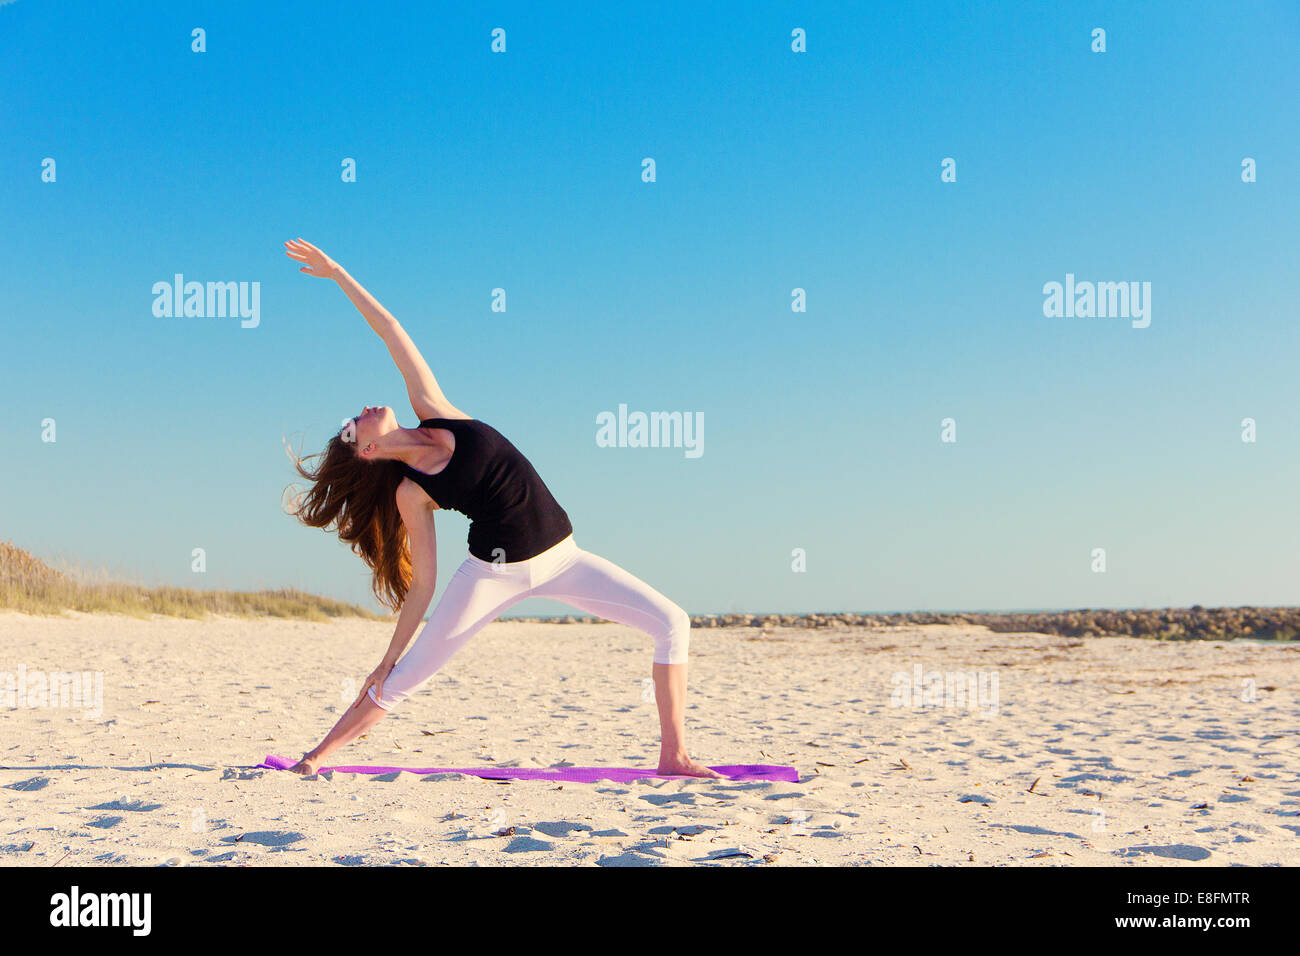 Woman practising reverse warrior pose on beach - Stock Image